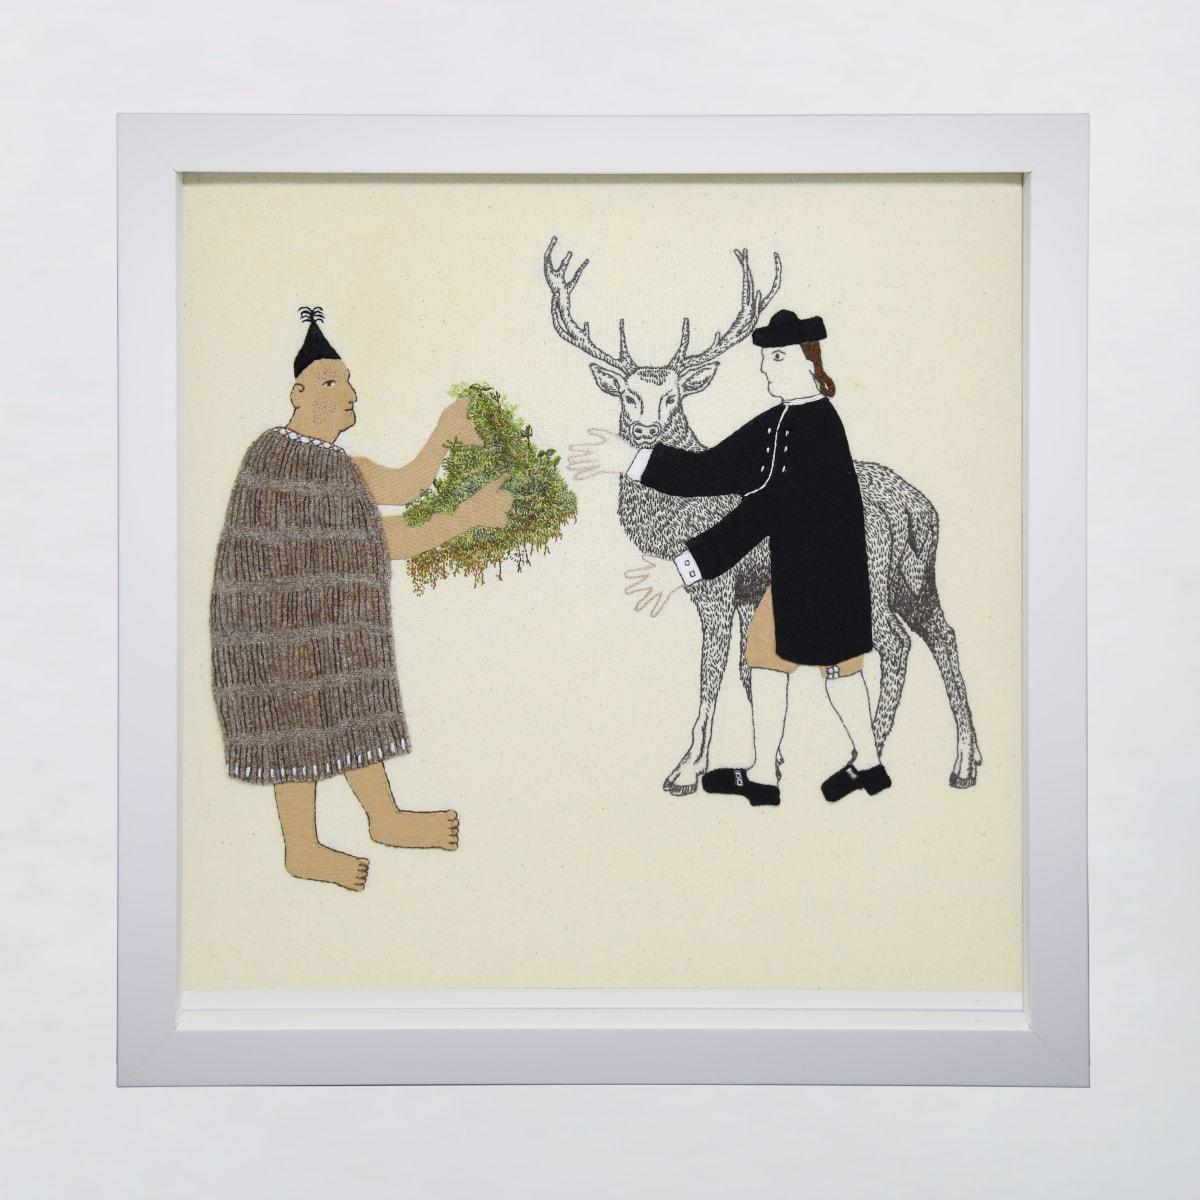 Sarah Munro Trade Items - Moss, Filmy Ferns, Deer, 2019 cloth and thread 330mm x 330mm